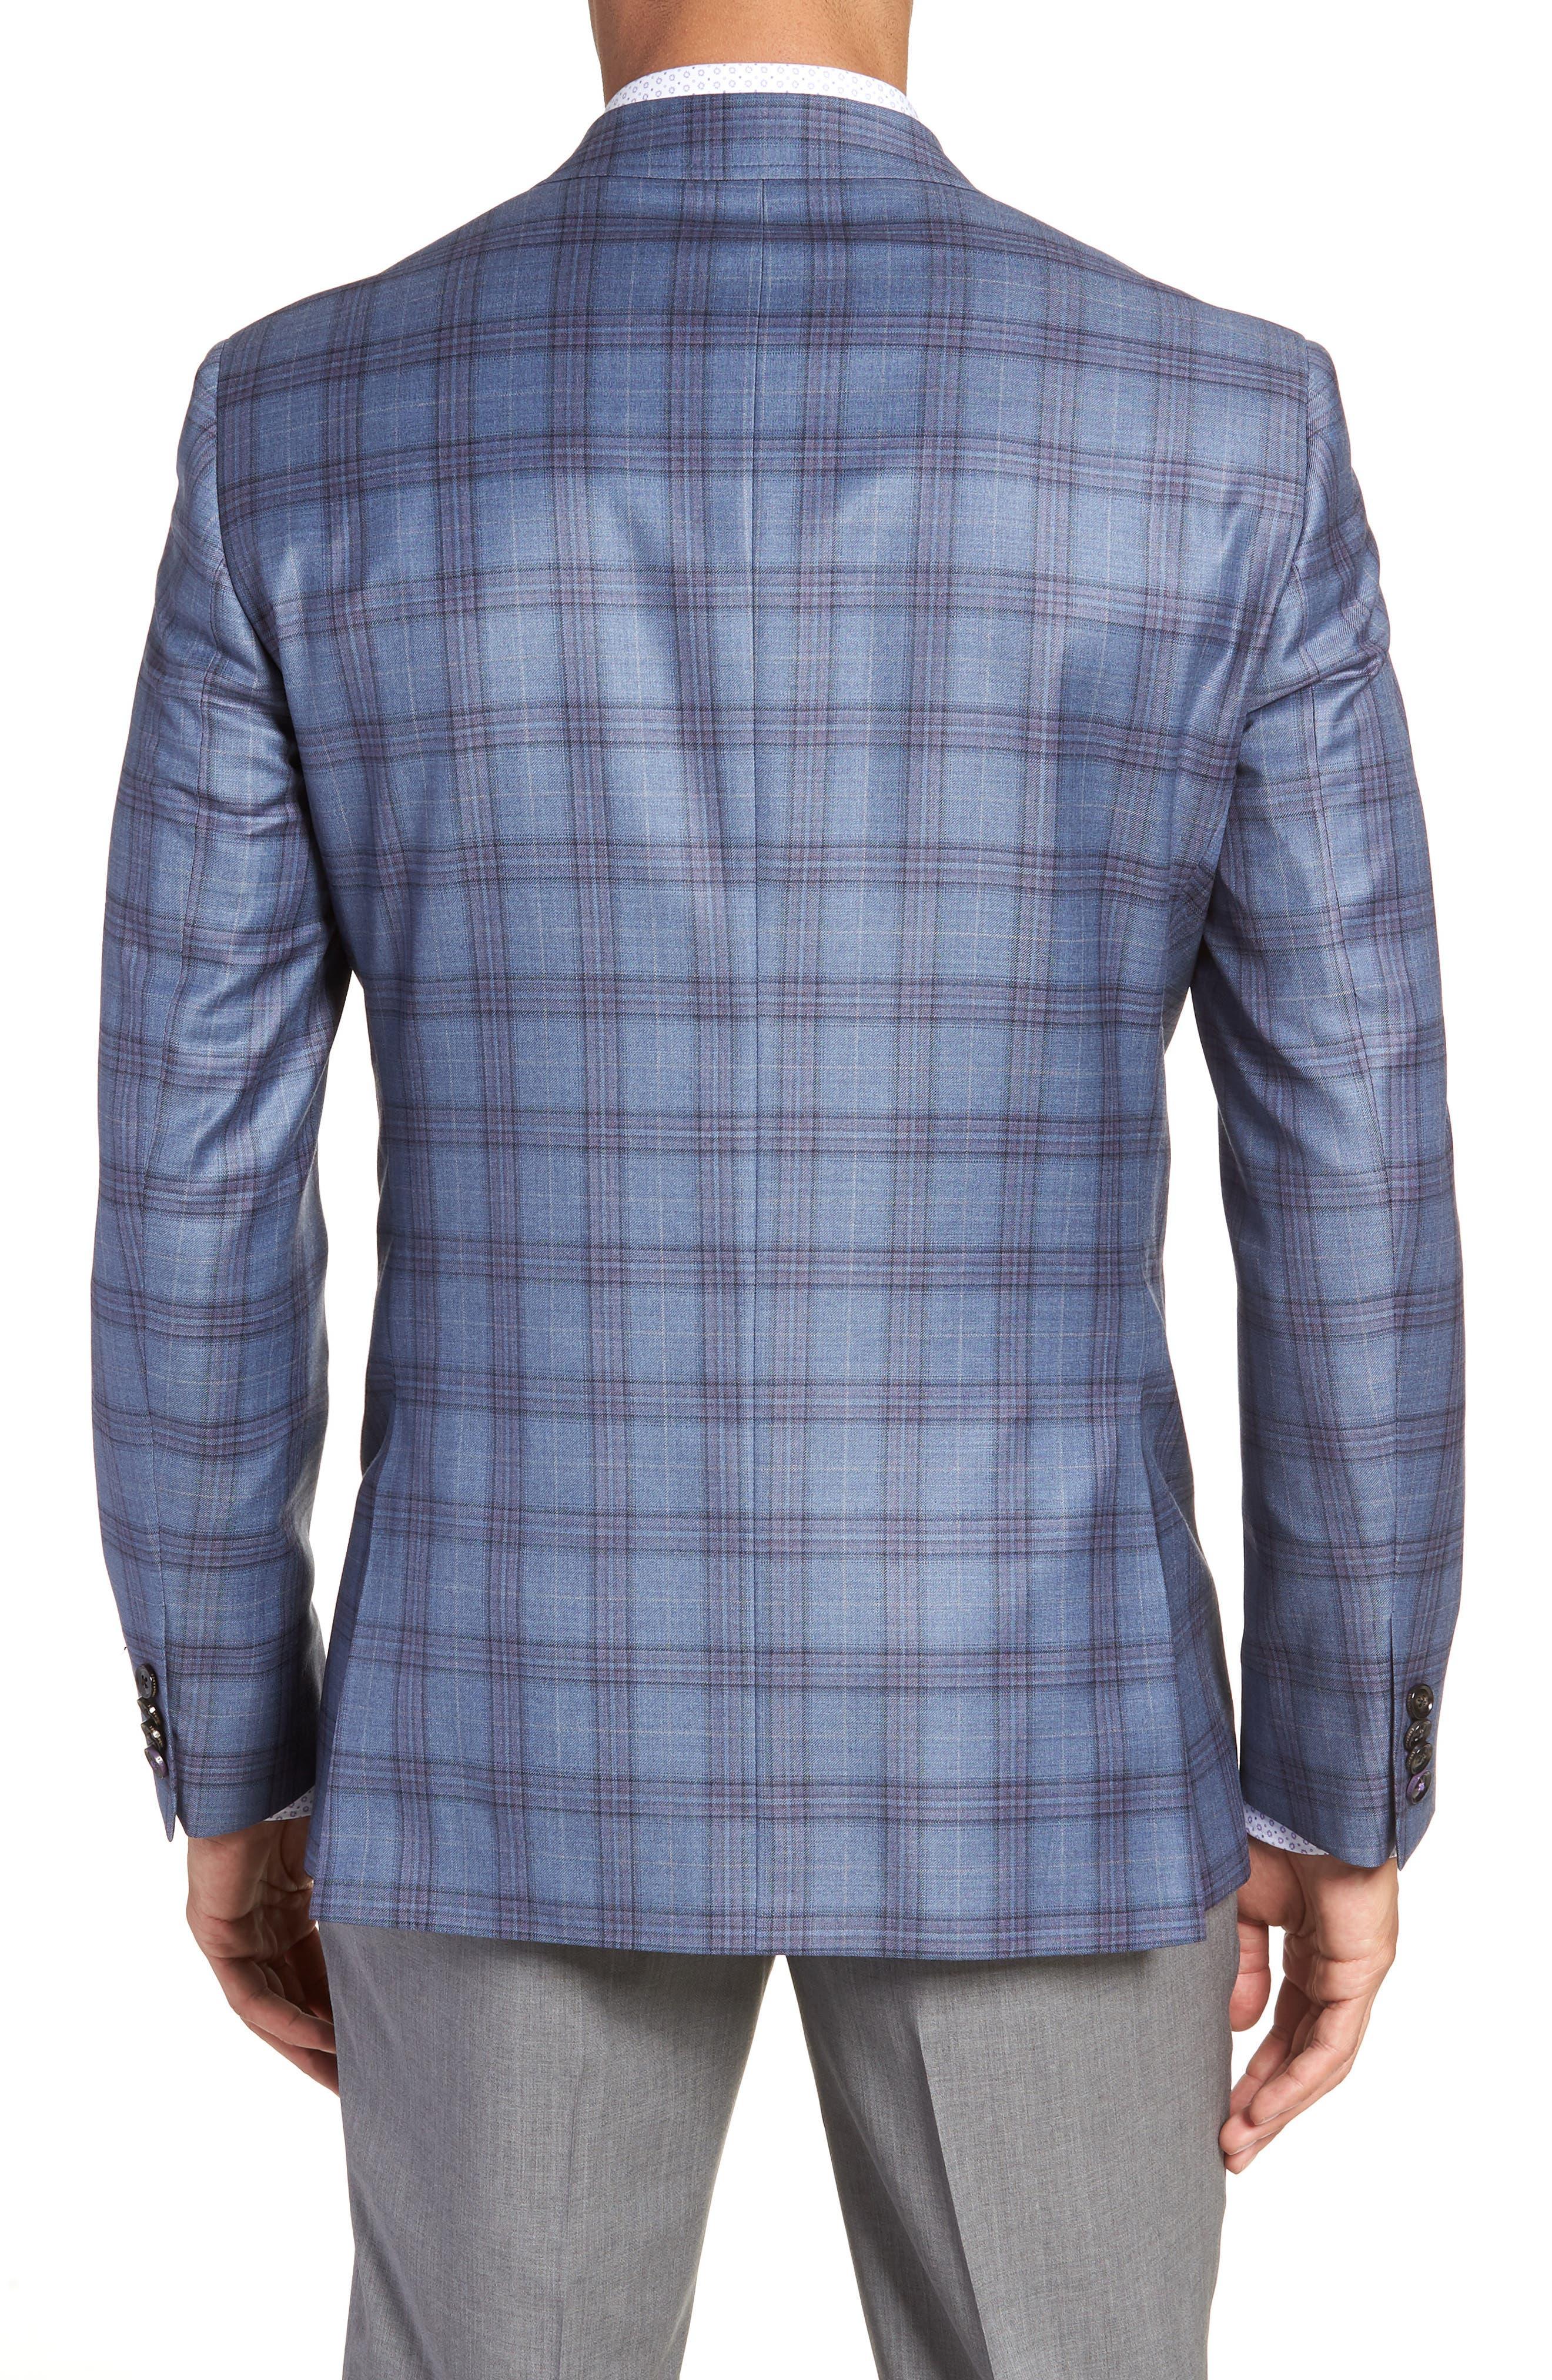 Jay Trim Fit Plaid Wool Sport Coat,                             Alternate thumbnail 2, color,                             Blue